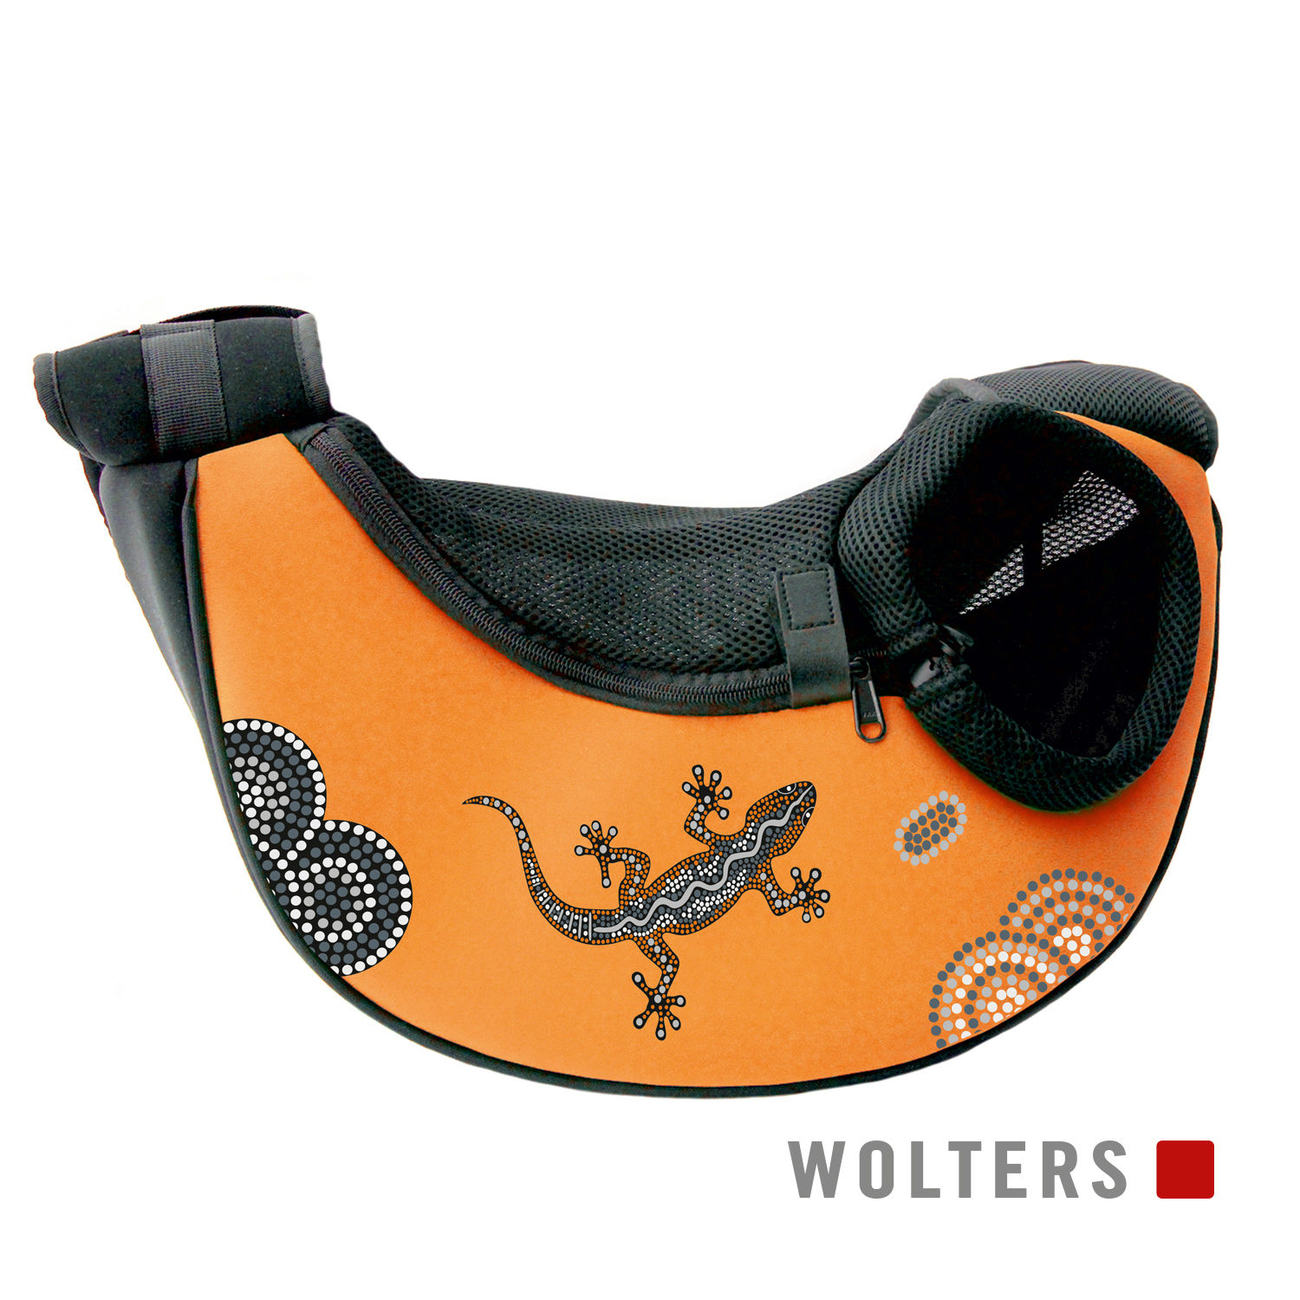 Wolters Bodypack Sunset Hundetasche, Bild 2